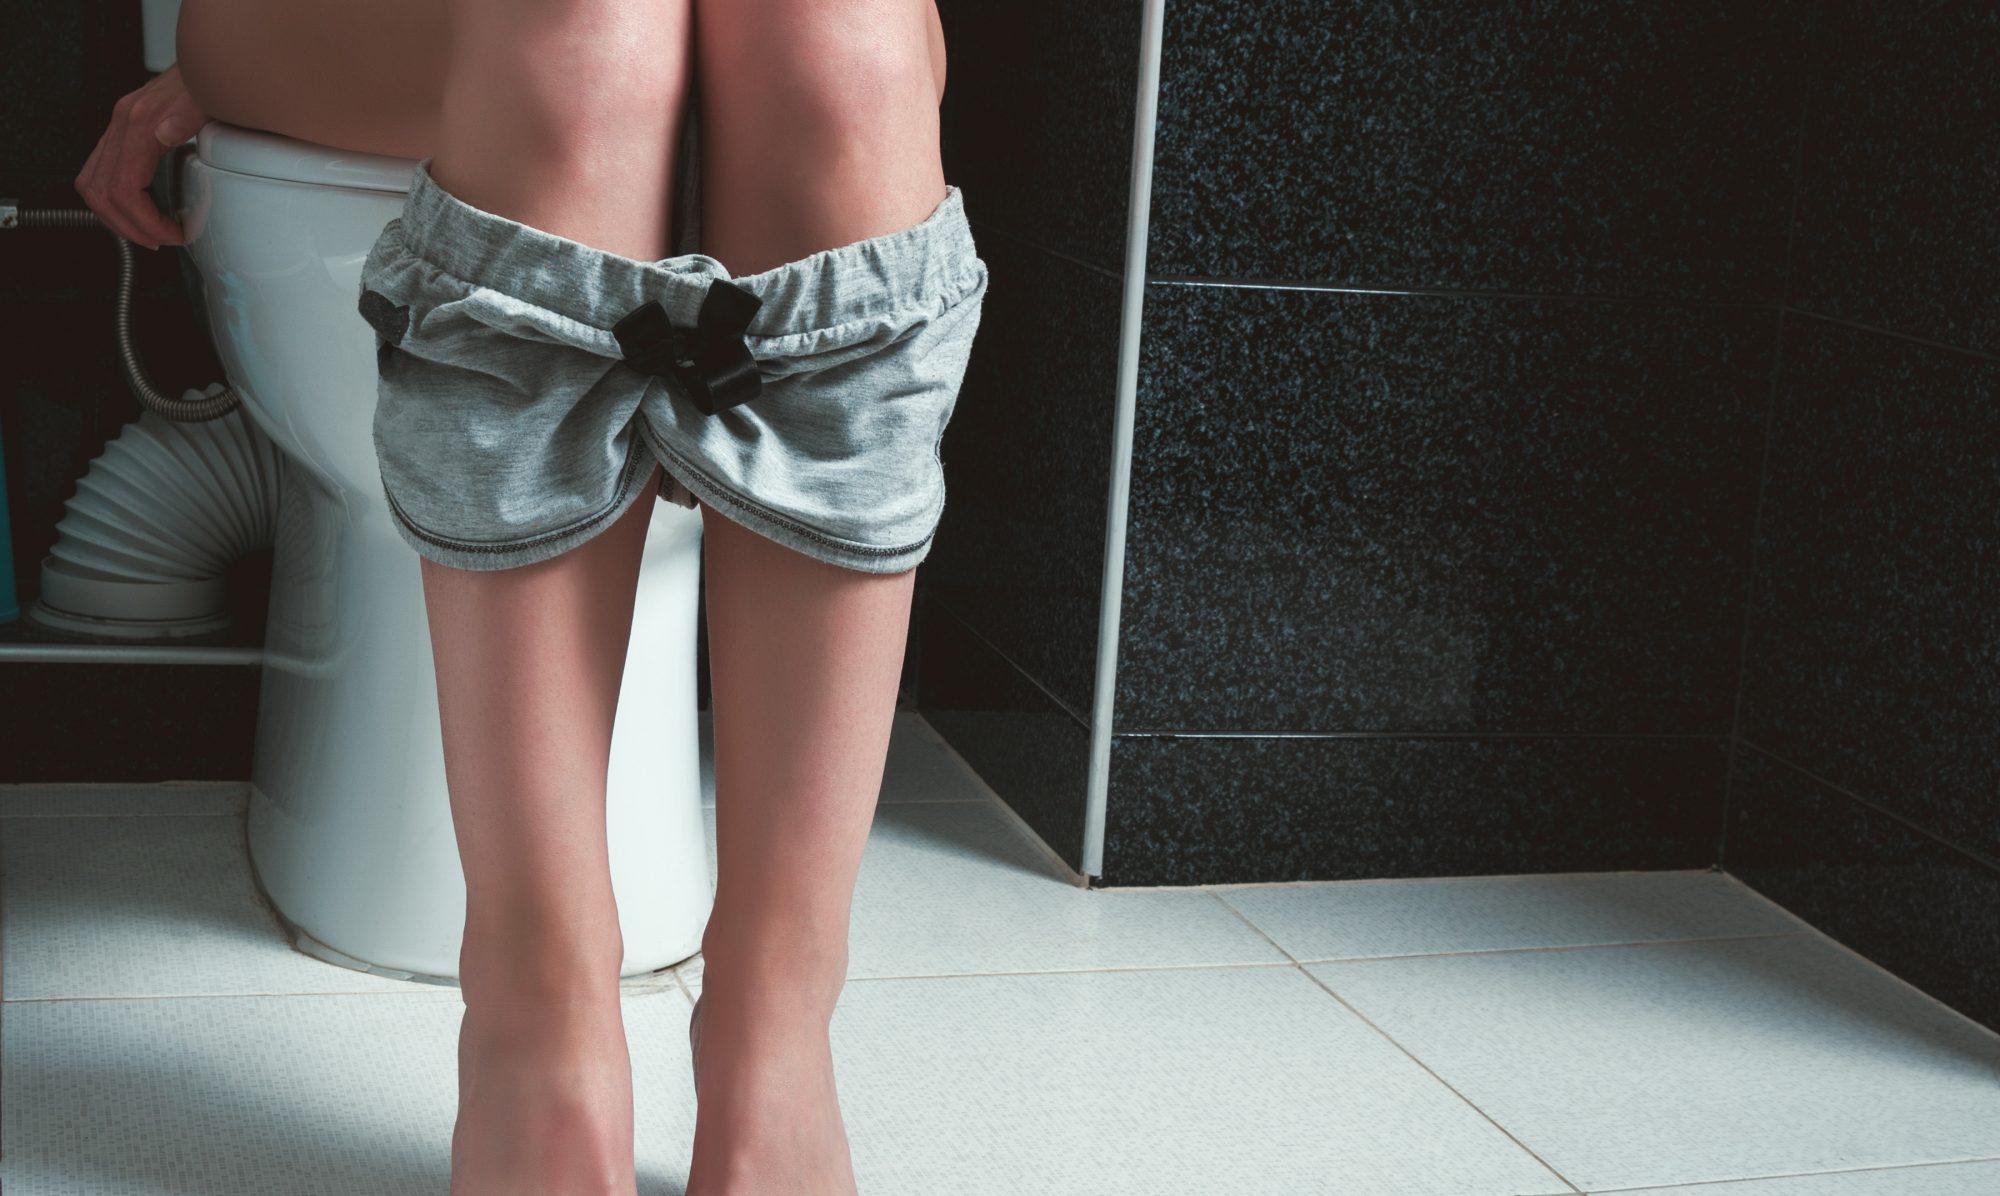 woman sitting on toilet